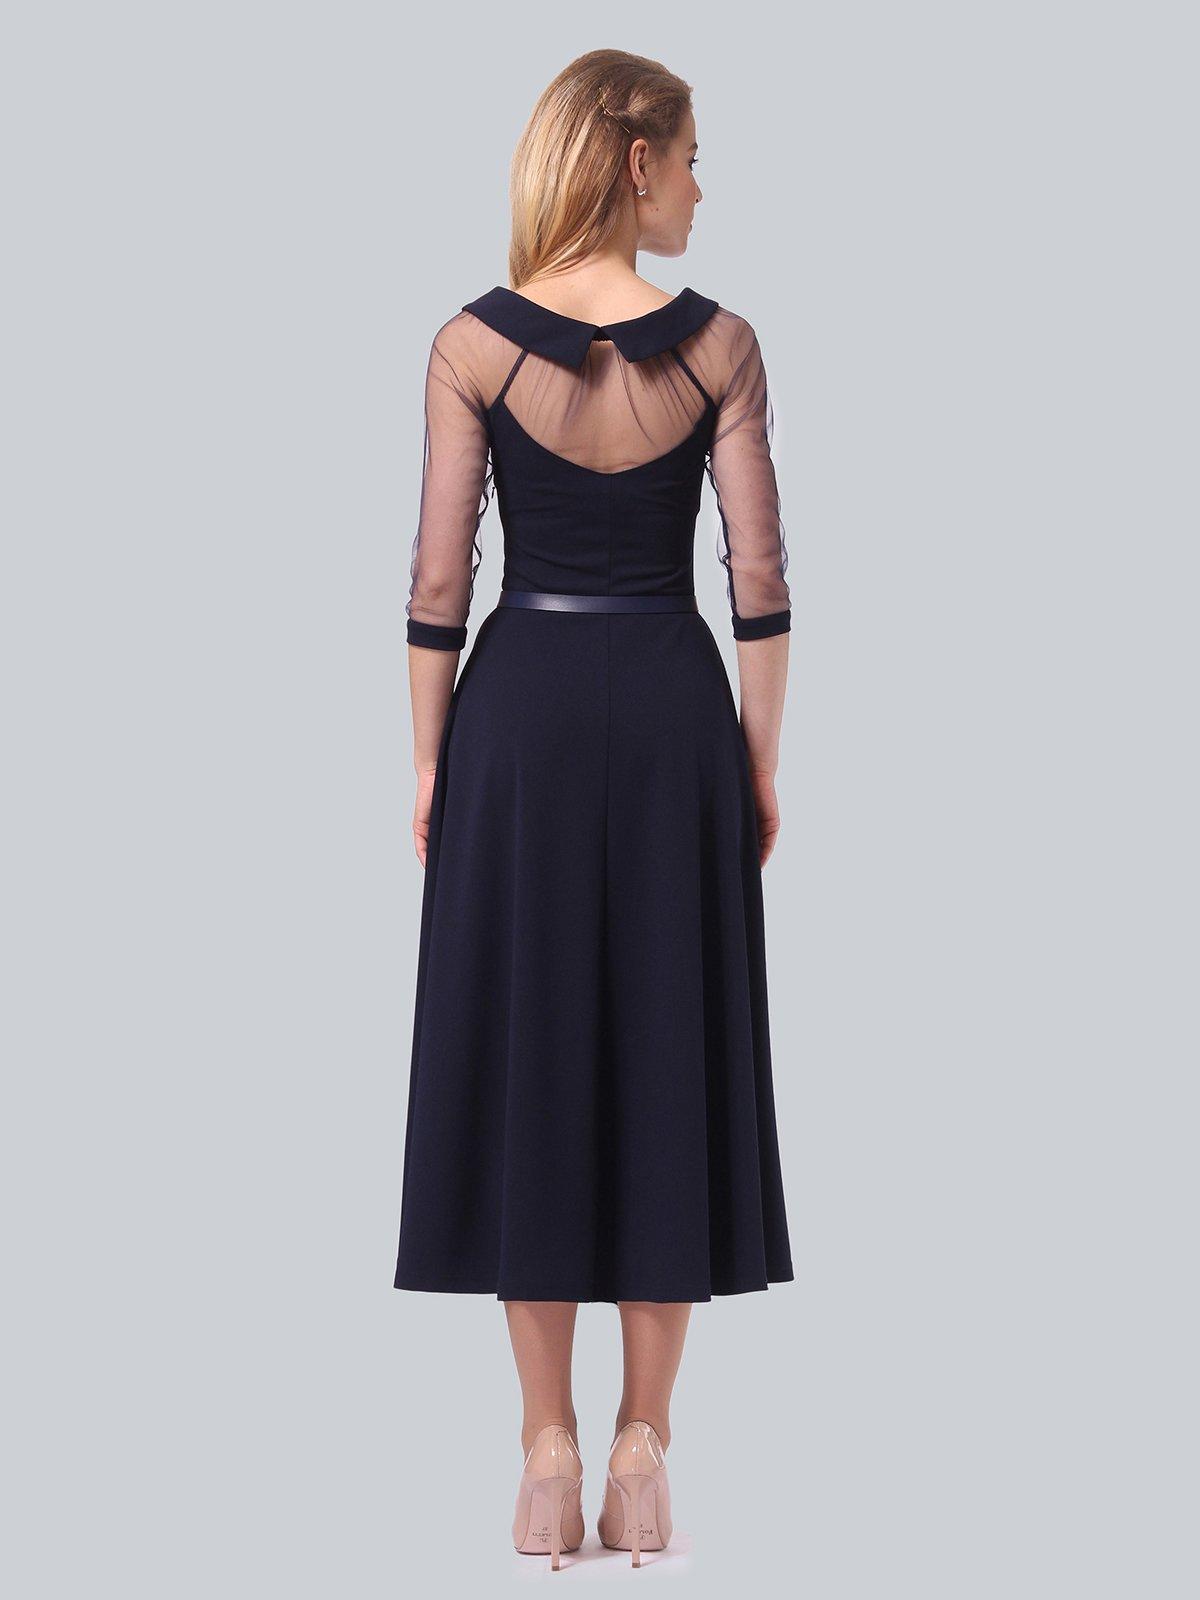 Платье темно-синее | 3879718 | фото 5